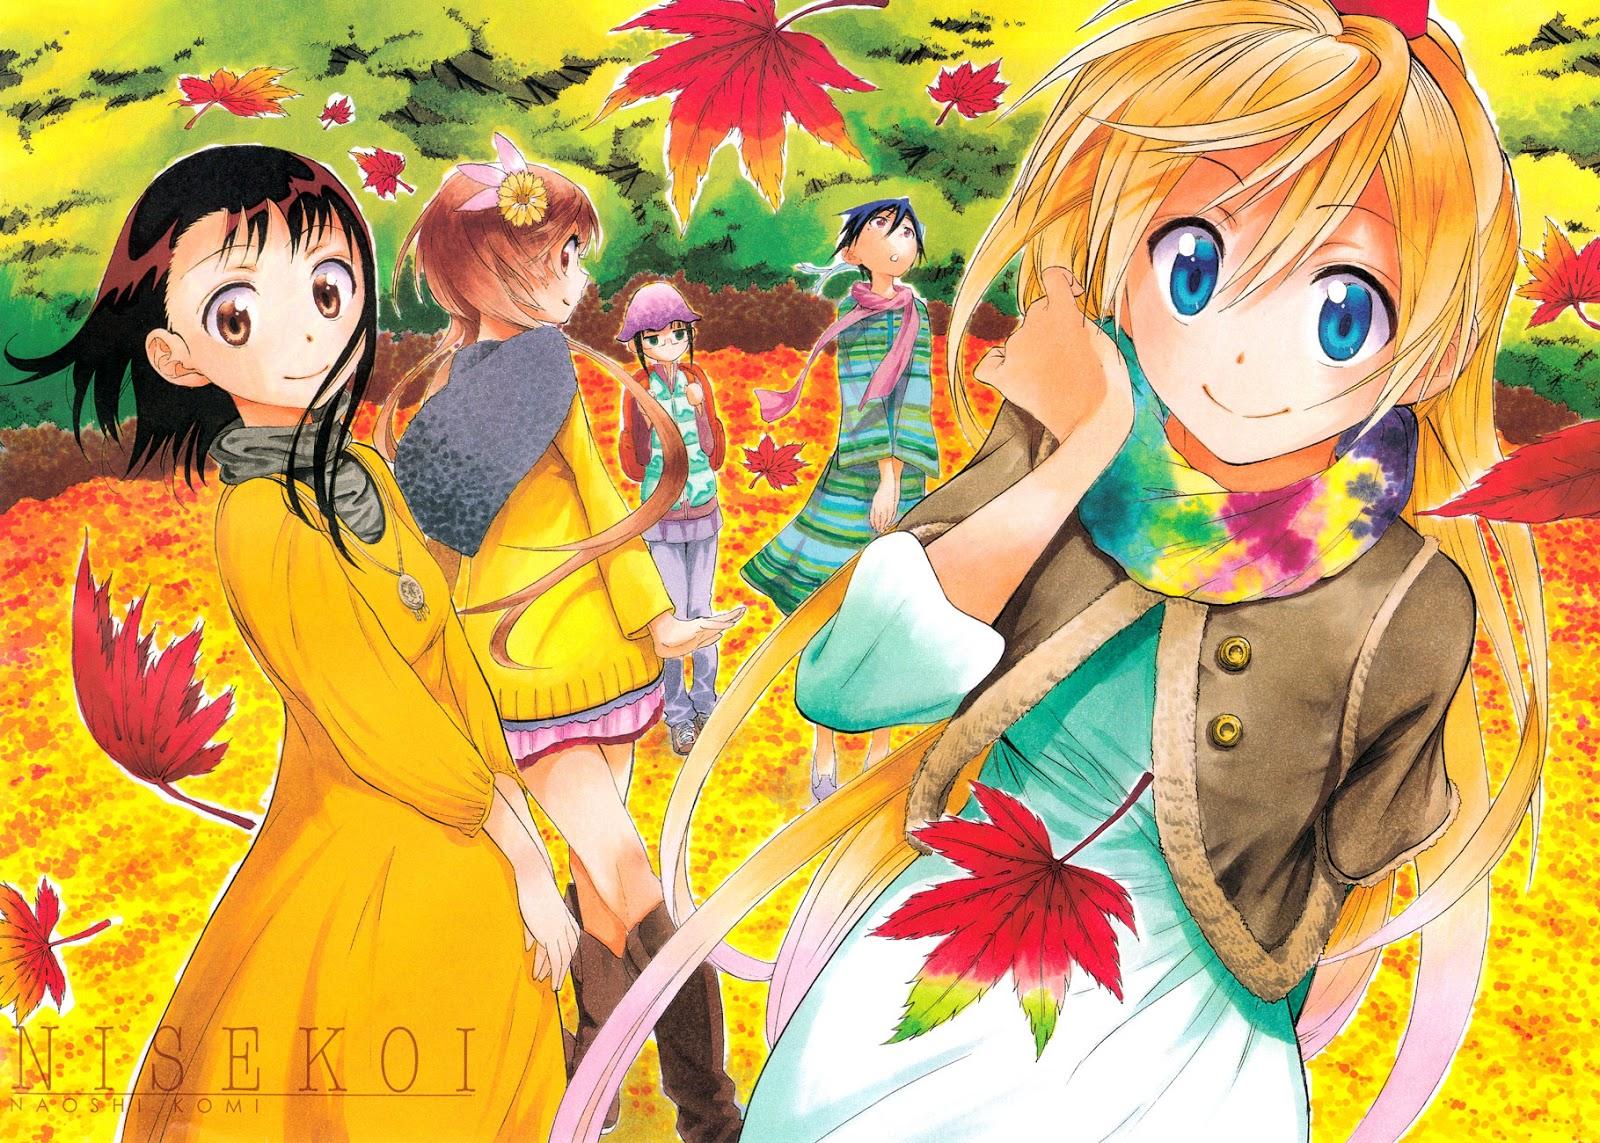 Nisekoi: segunda temporada do anime é anunciada 34163_NISE49_02-03b